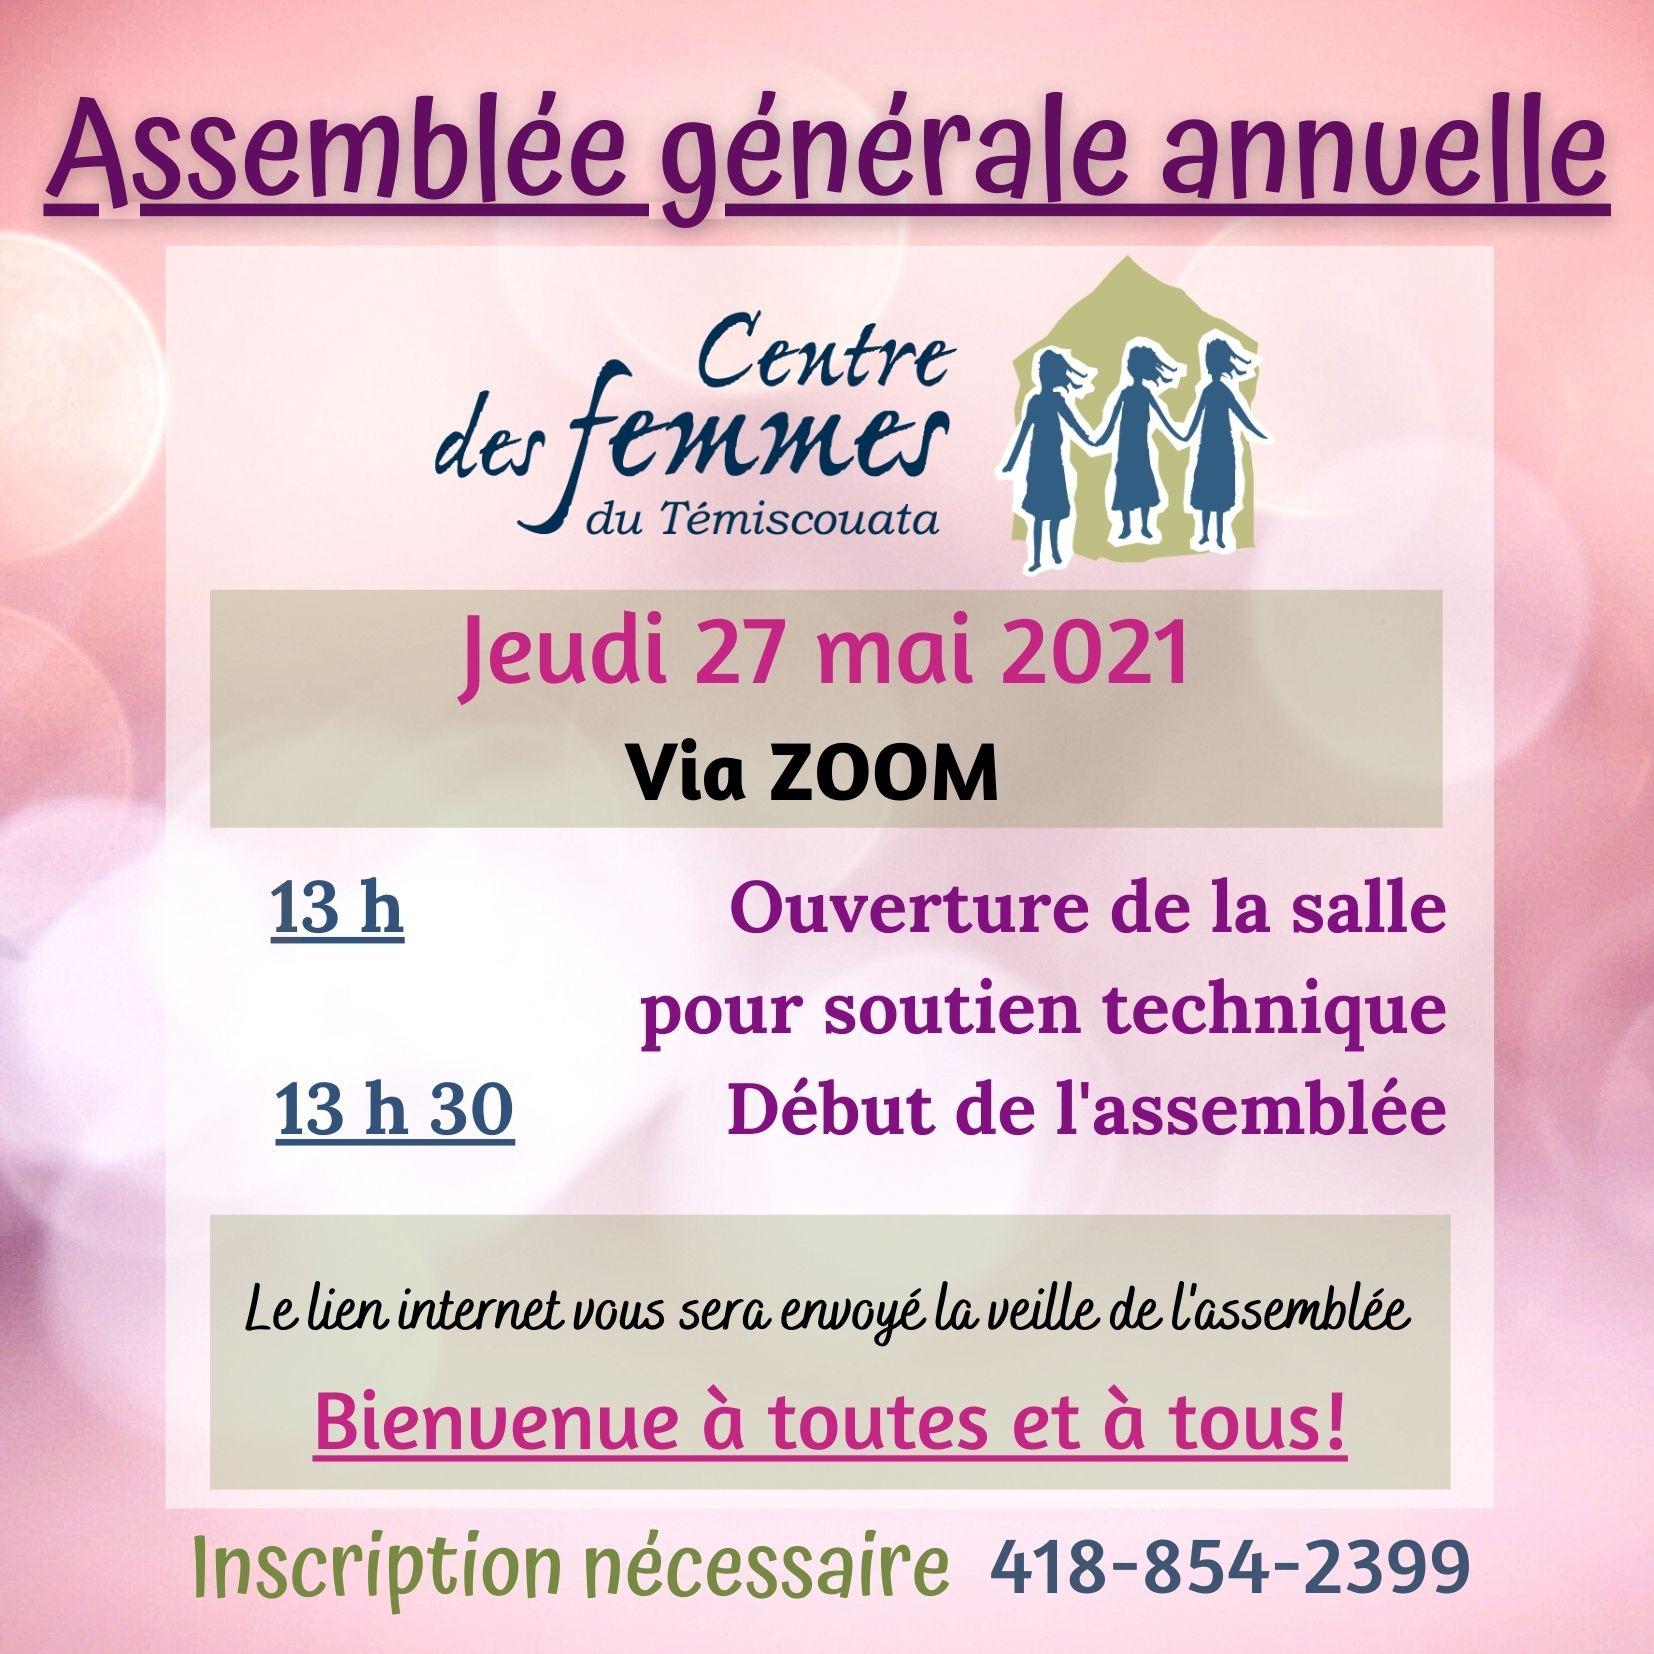 affiche AGA 2021